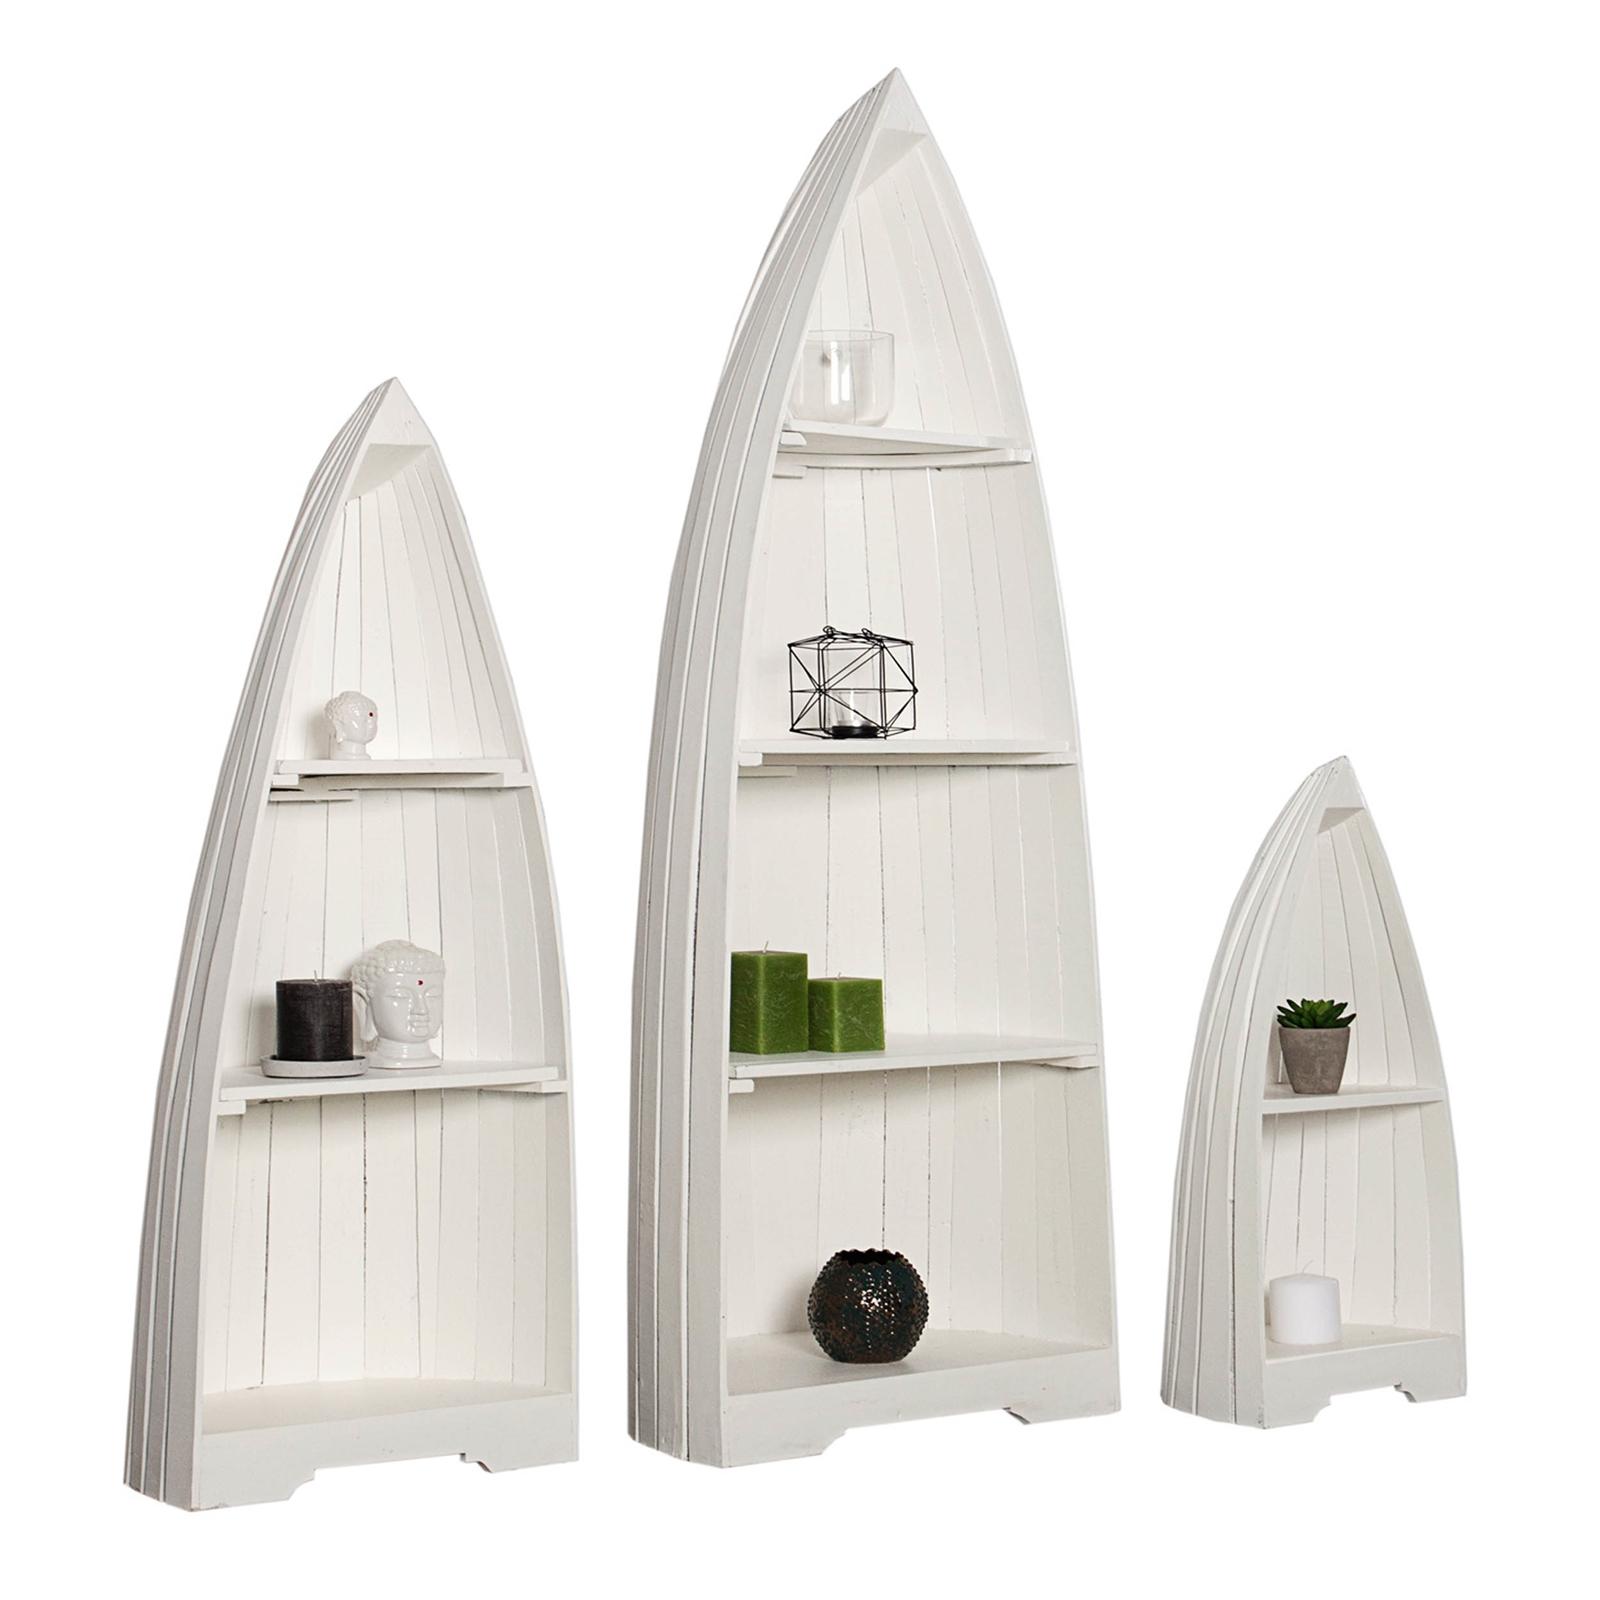 3er set landhaus boot regale nautic mahagoni wei holzregale badm bel ebay. Black Bedroom Furniture Sets. Home Design Ideas